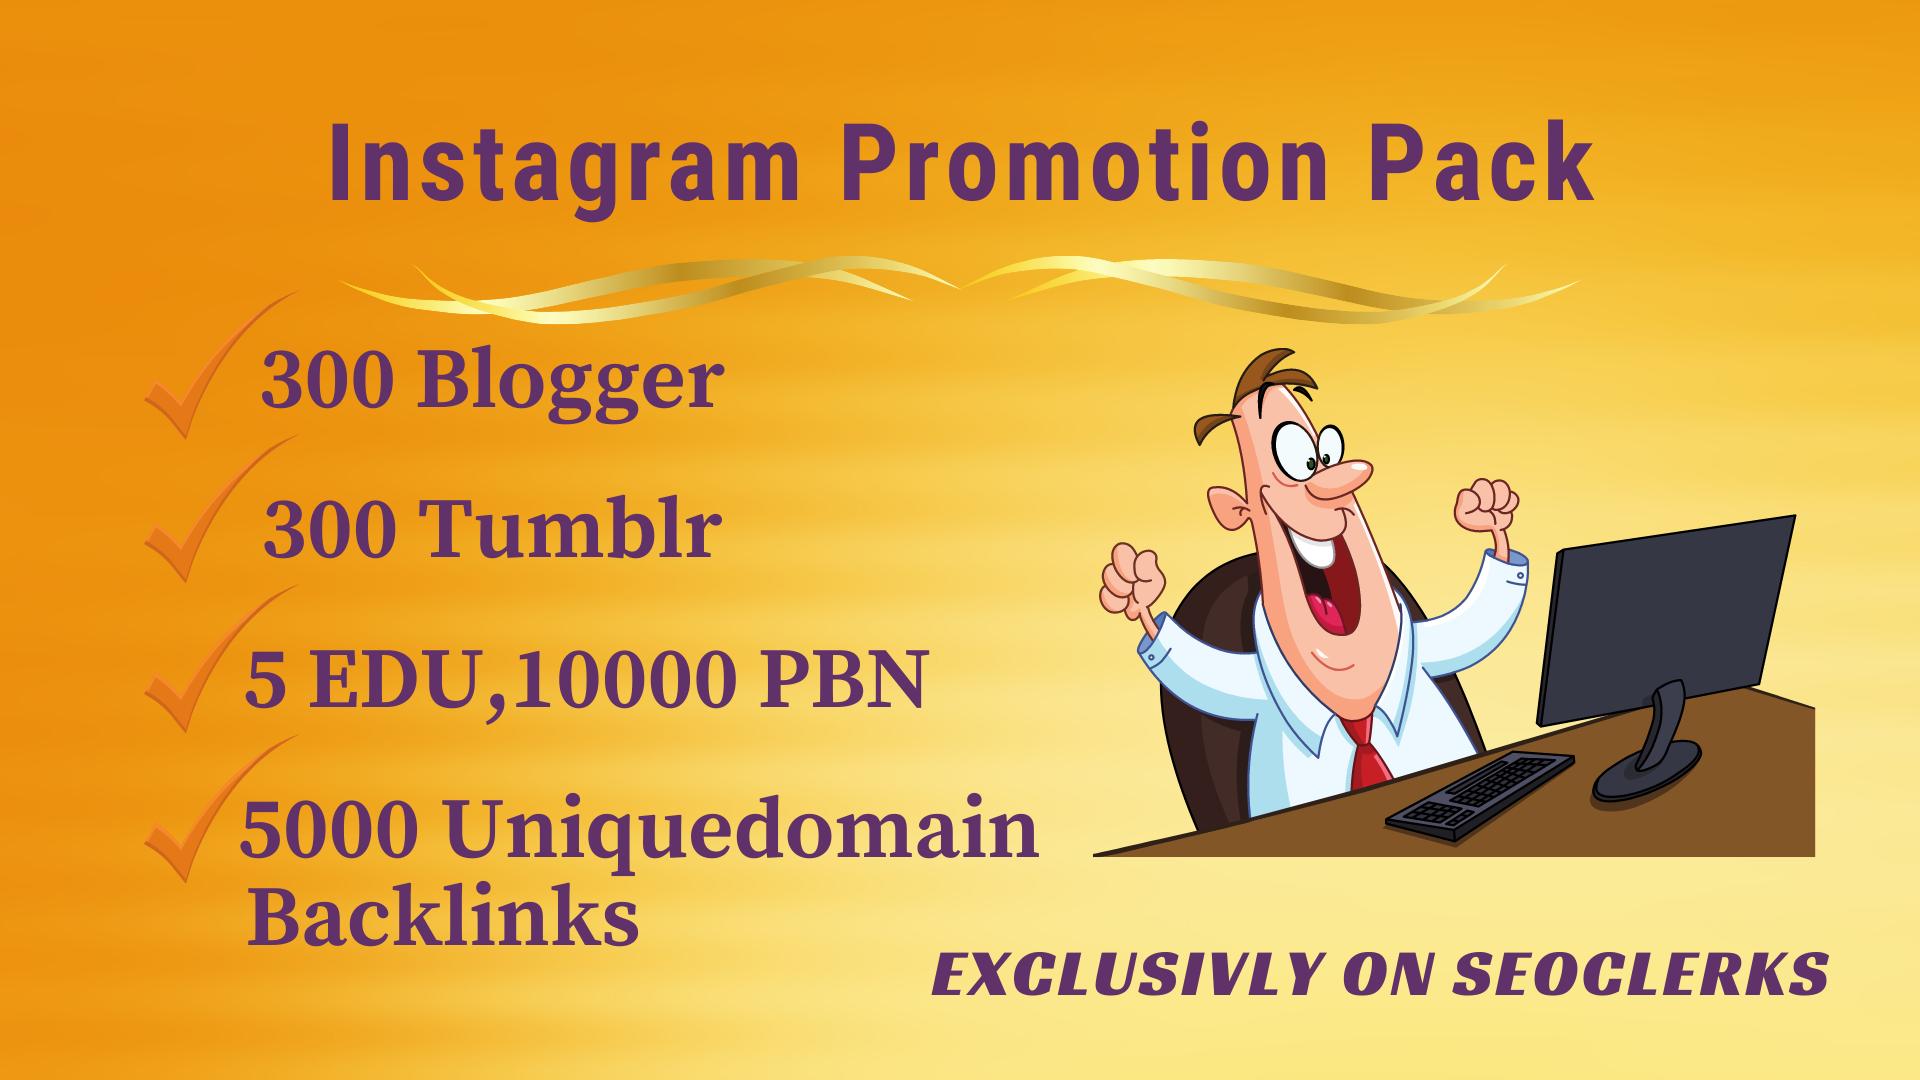 Instagram Promo pack - Get 5 EDU,  300 blogger, 300 tumblr,  10000 PBN,  5000 uniquedomain backlinks